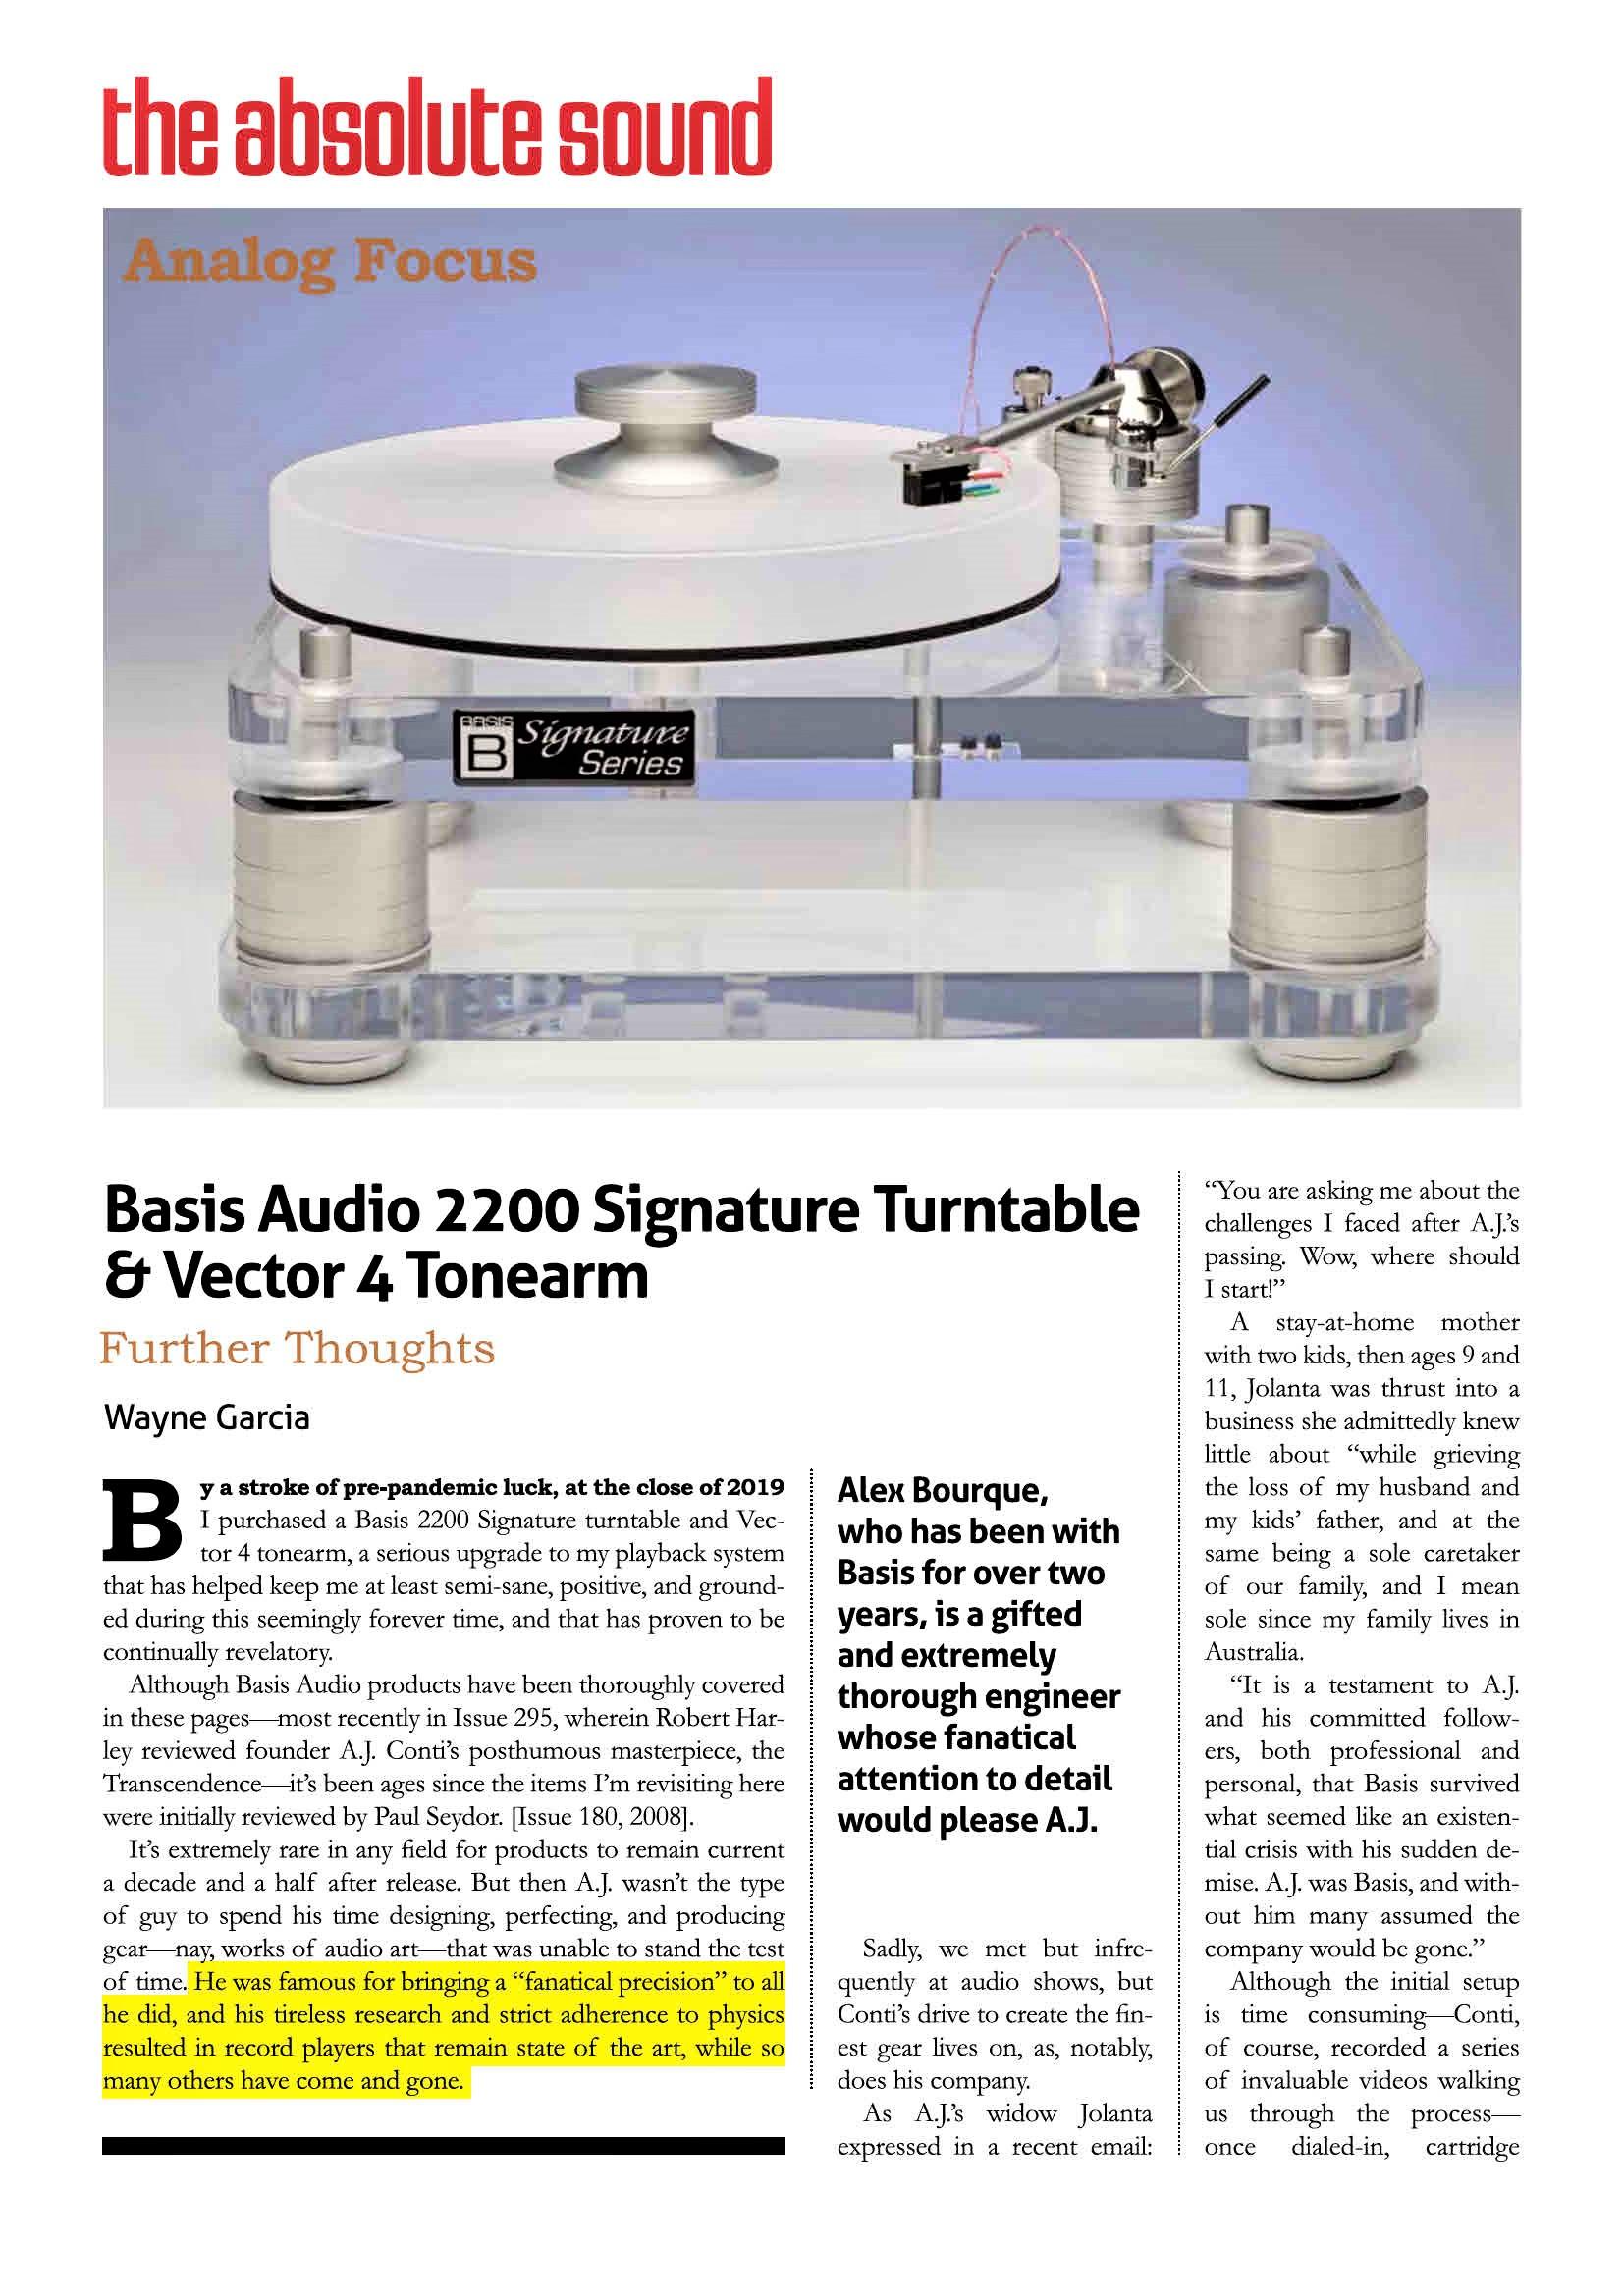 Basis Audio 2200 Signature Turntable – Vector 4 Tonearm